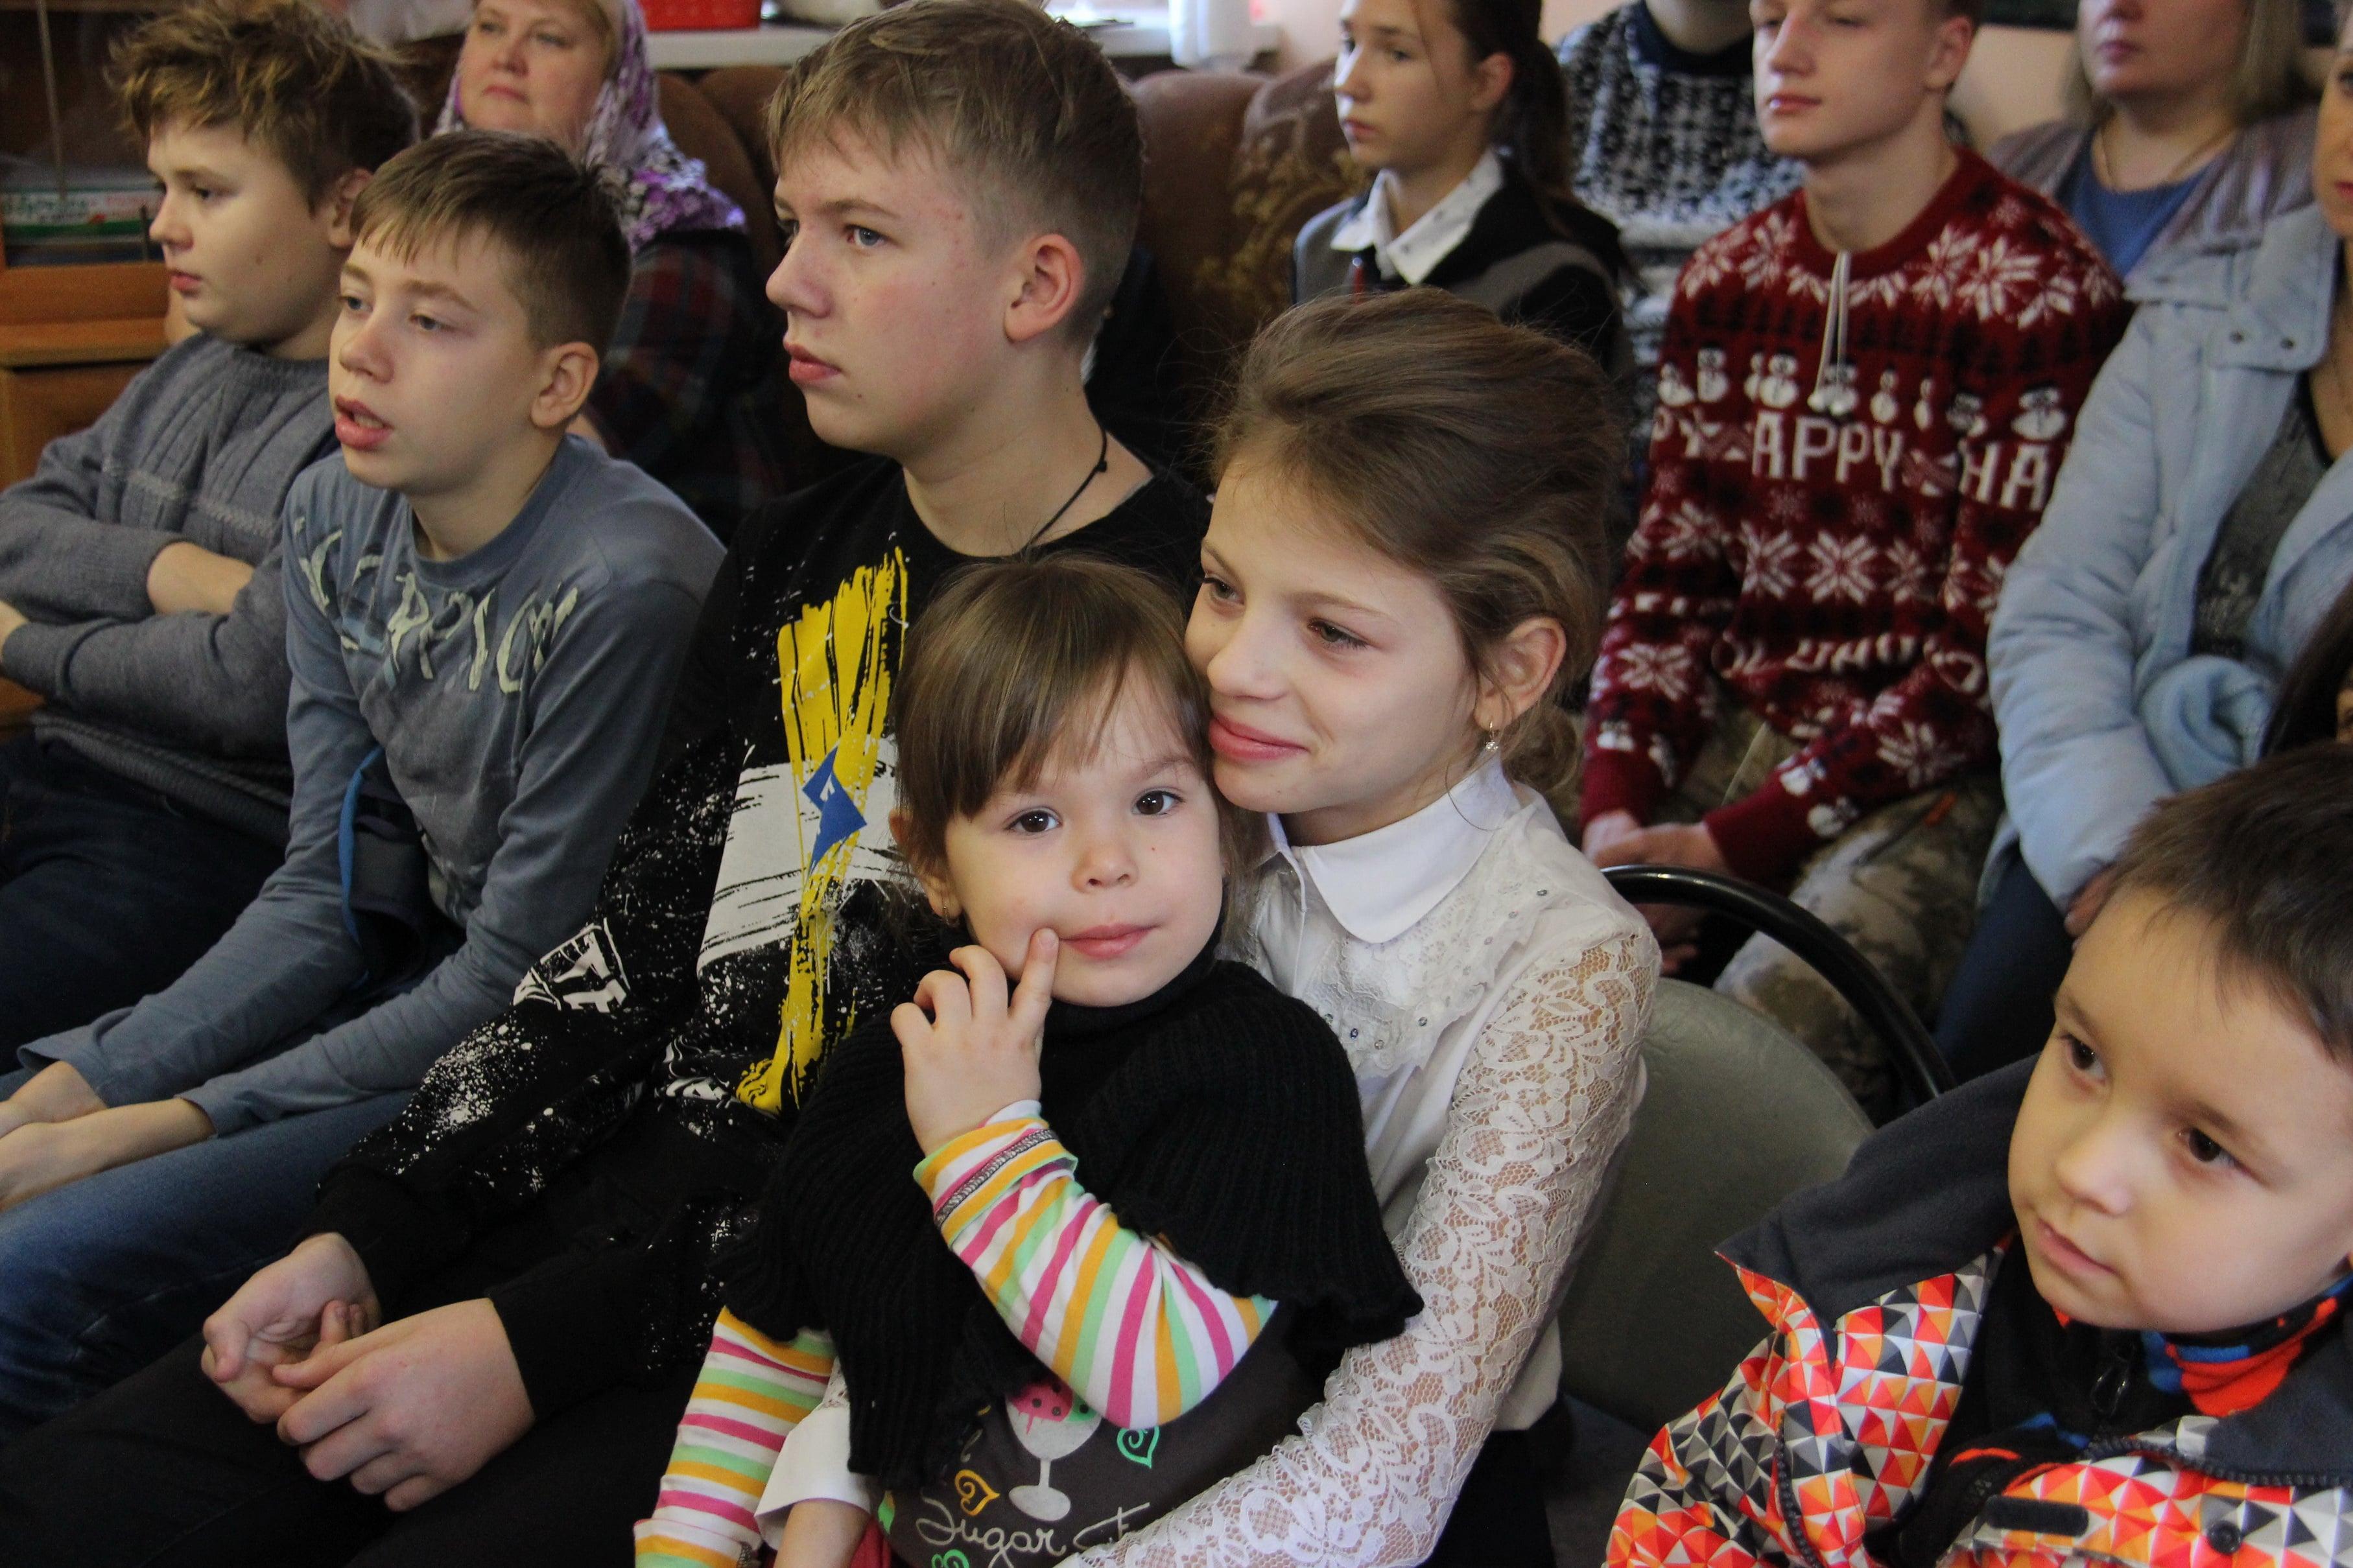 http://monuspen.ru/photoreports/b1b252ad26e1d6ada51c25ebbc9be7g0.JPG